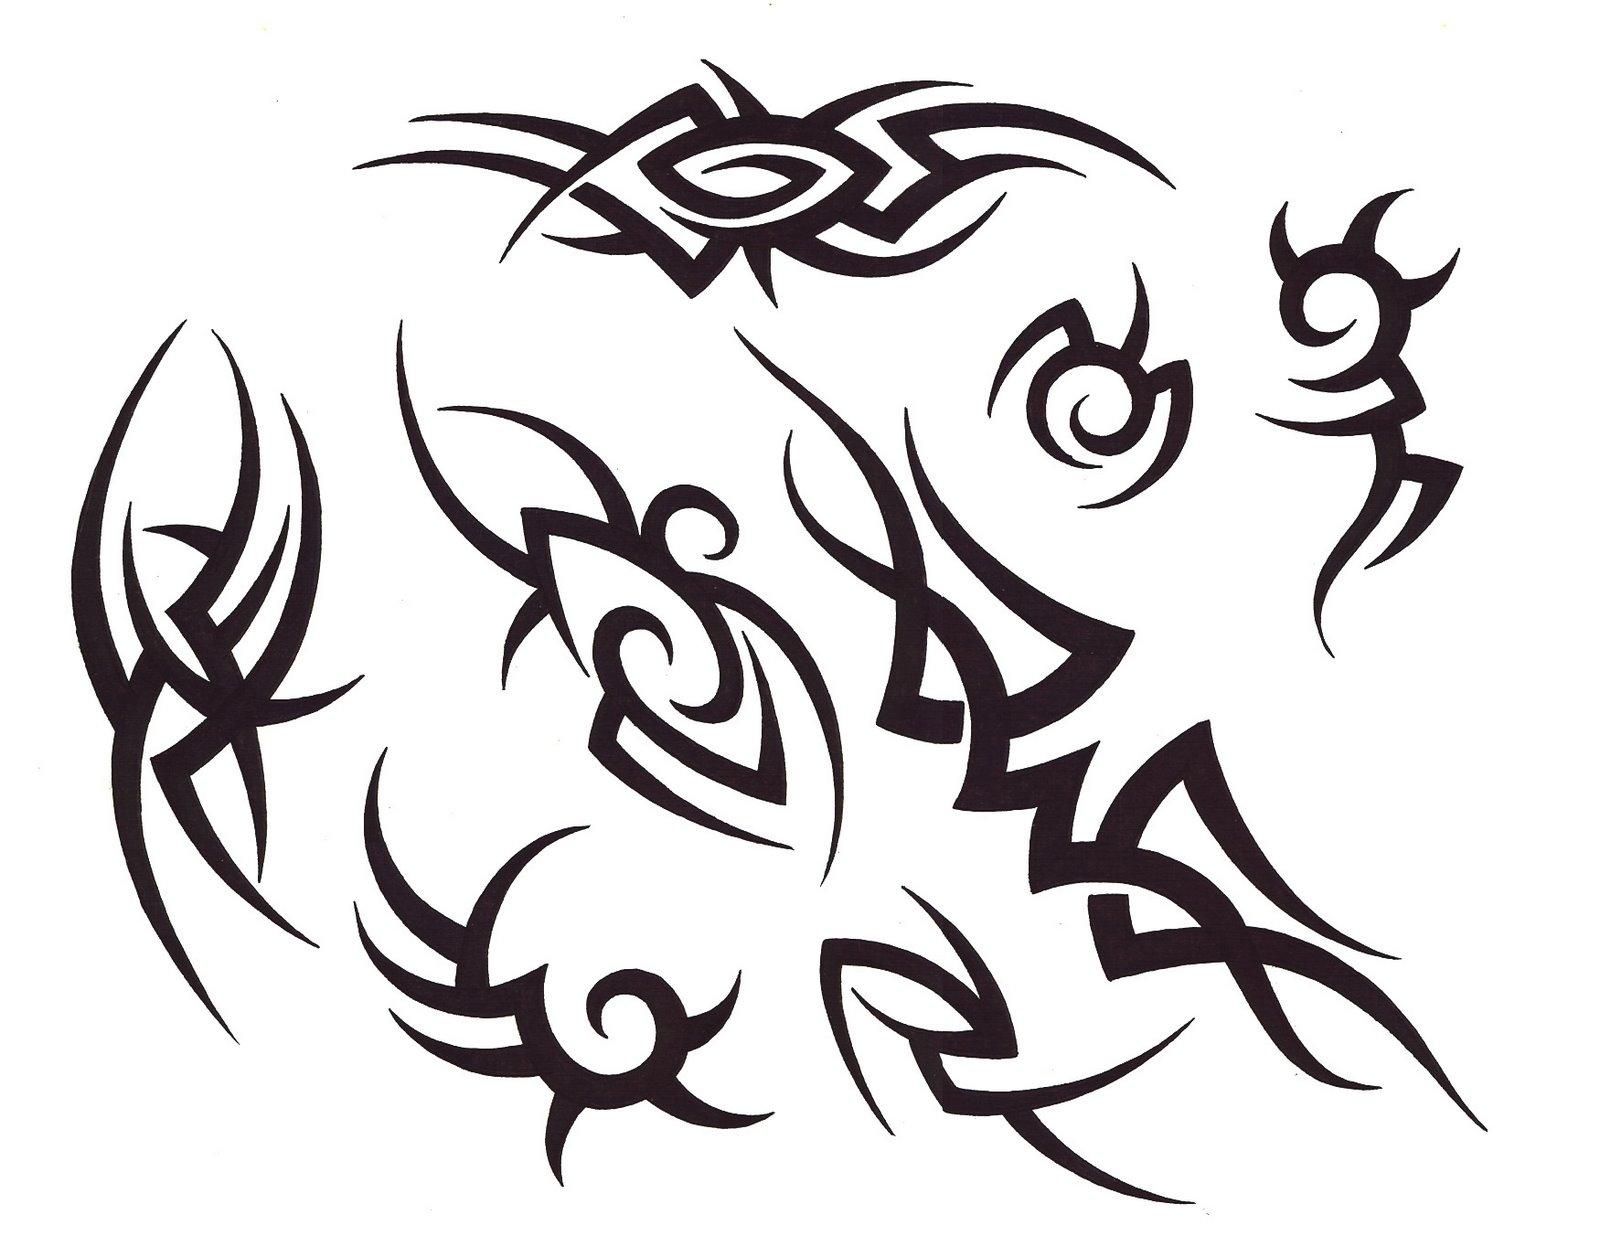 Forearm Tattoo Drawing at GetDrawings.com